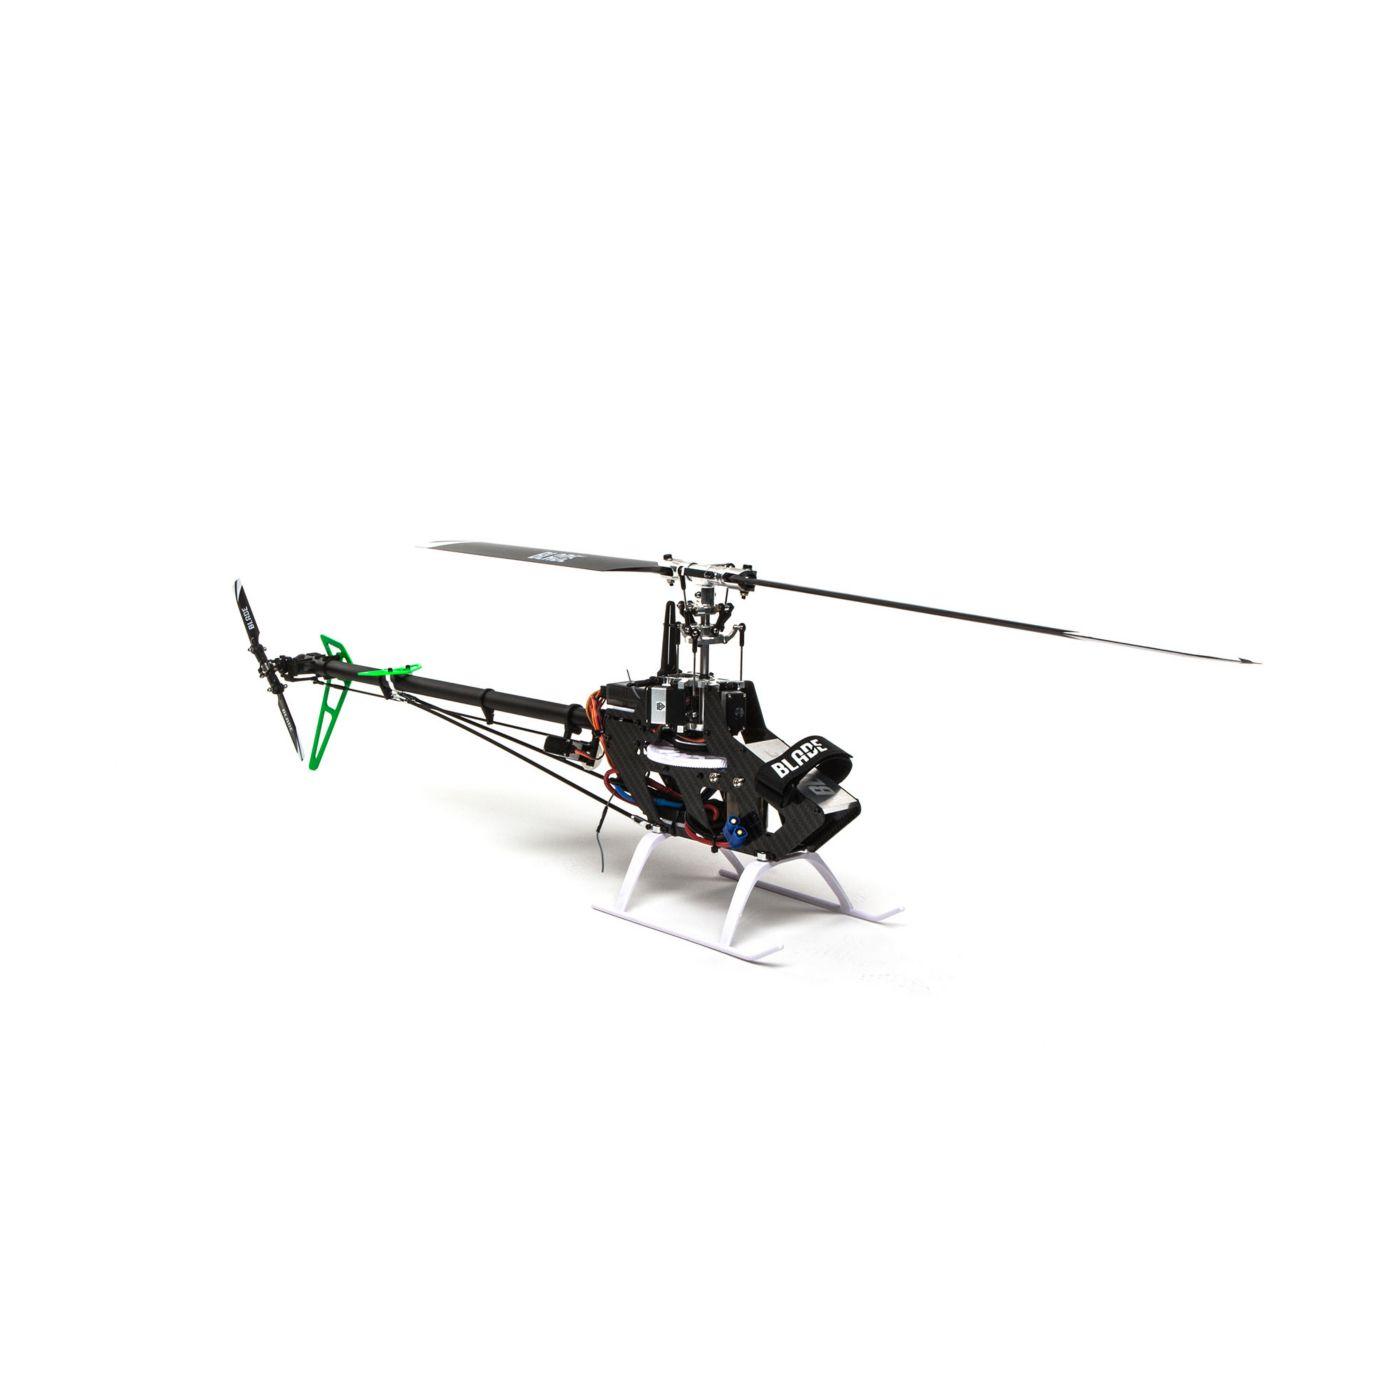 Blade 360 CFX 3S Elicottero rc bnf 3d 03